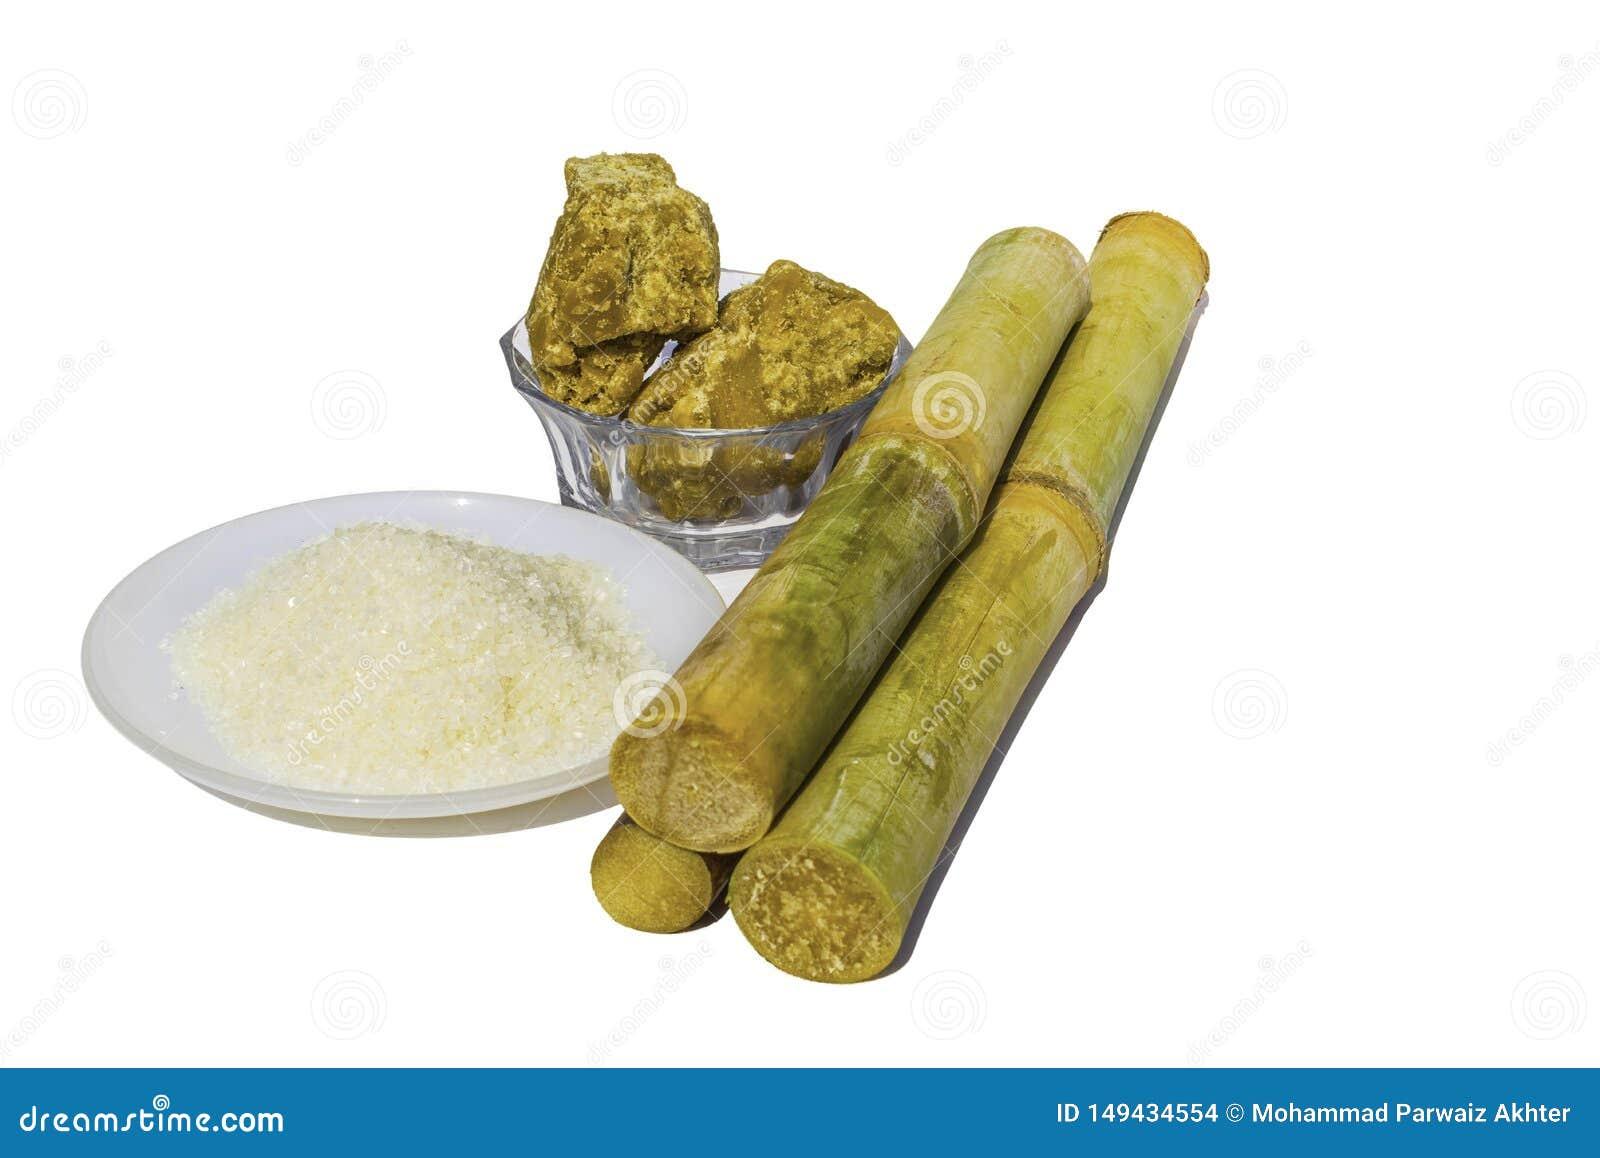 Pezzi di canna da zucchero con zucchero bianco